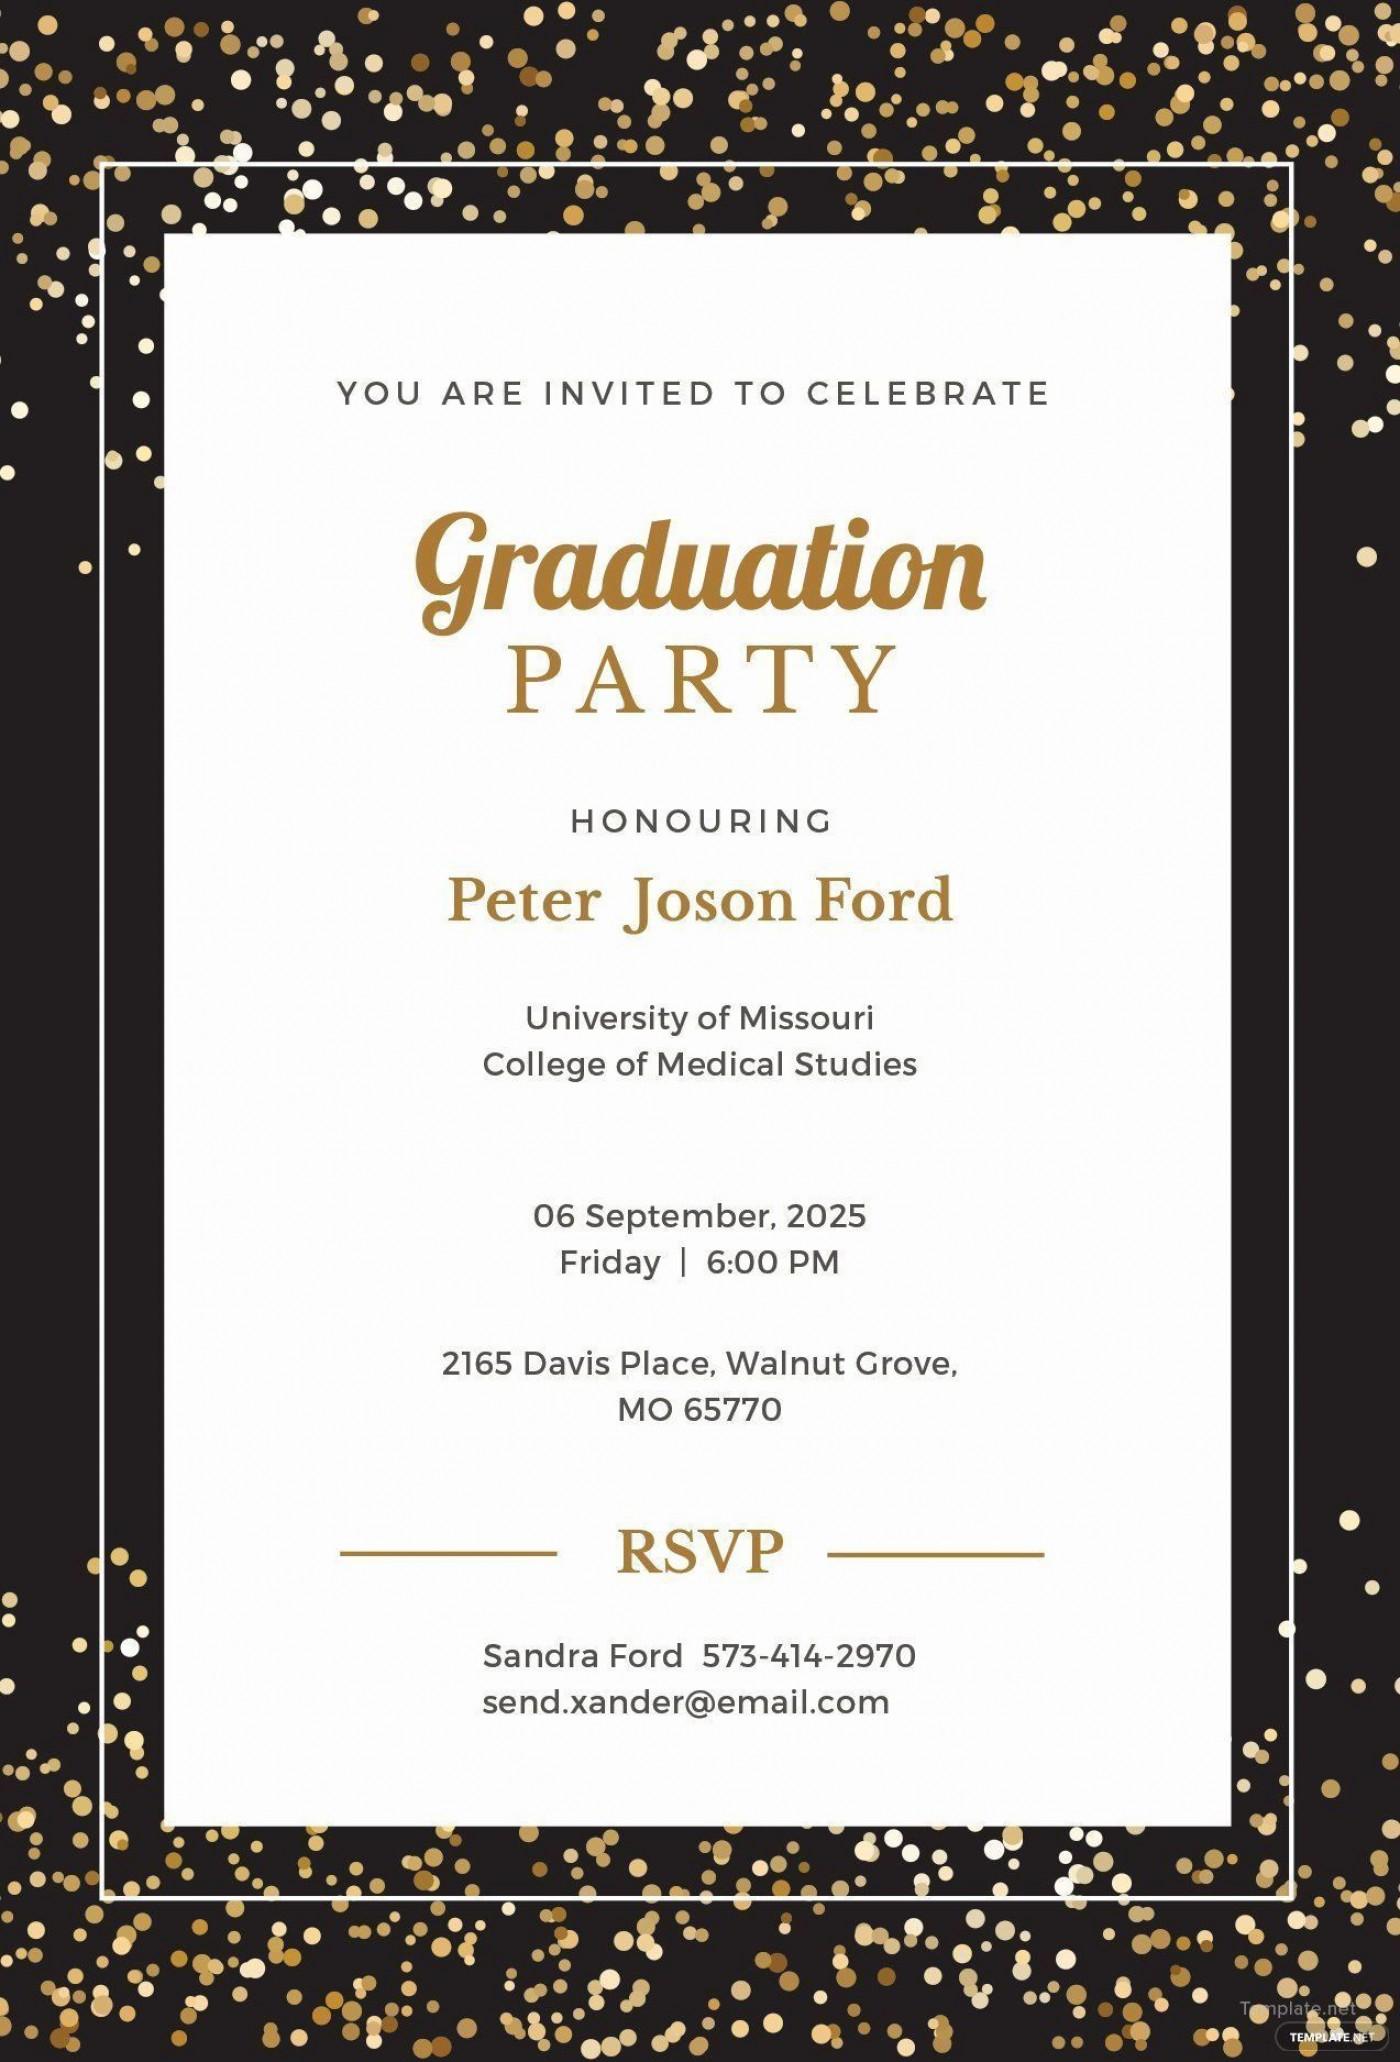 008 Sensational Microsoft Word Graduation Invitation Template Idea  Party1400